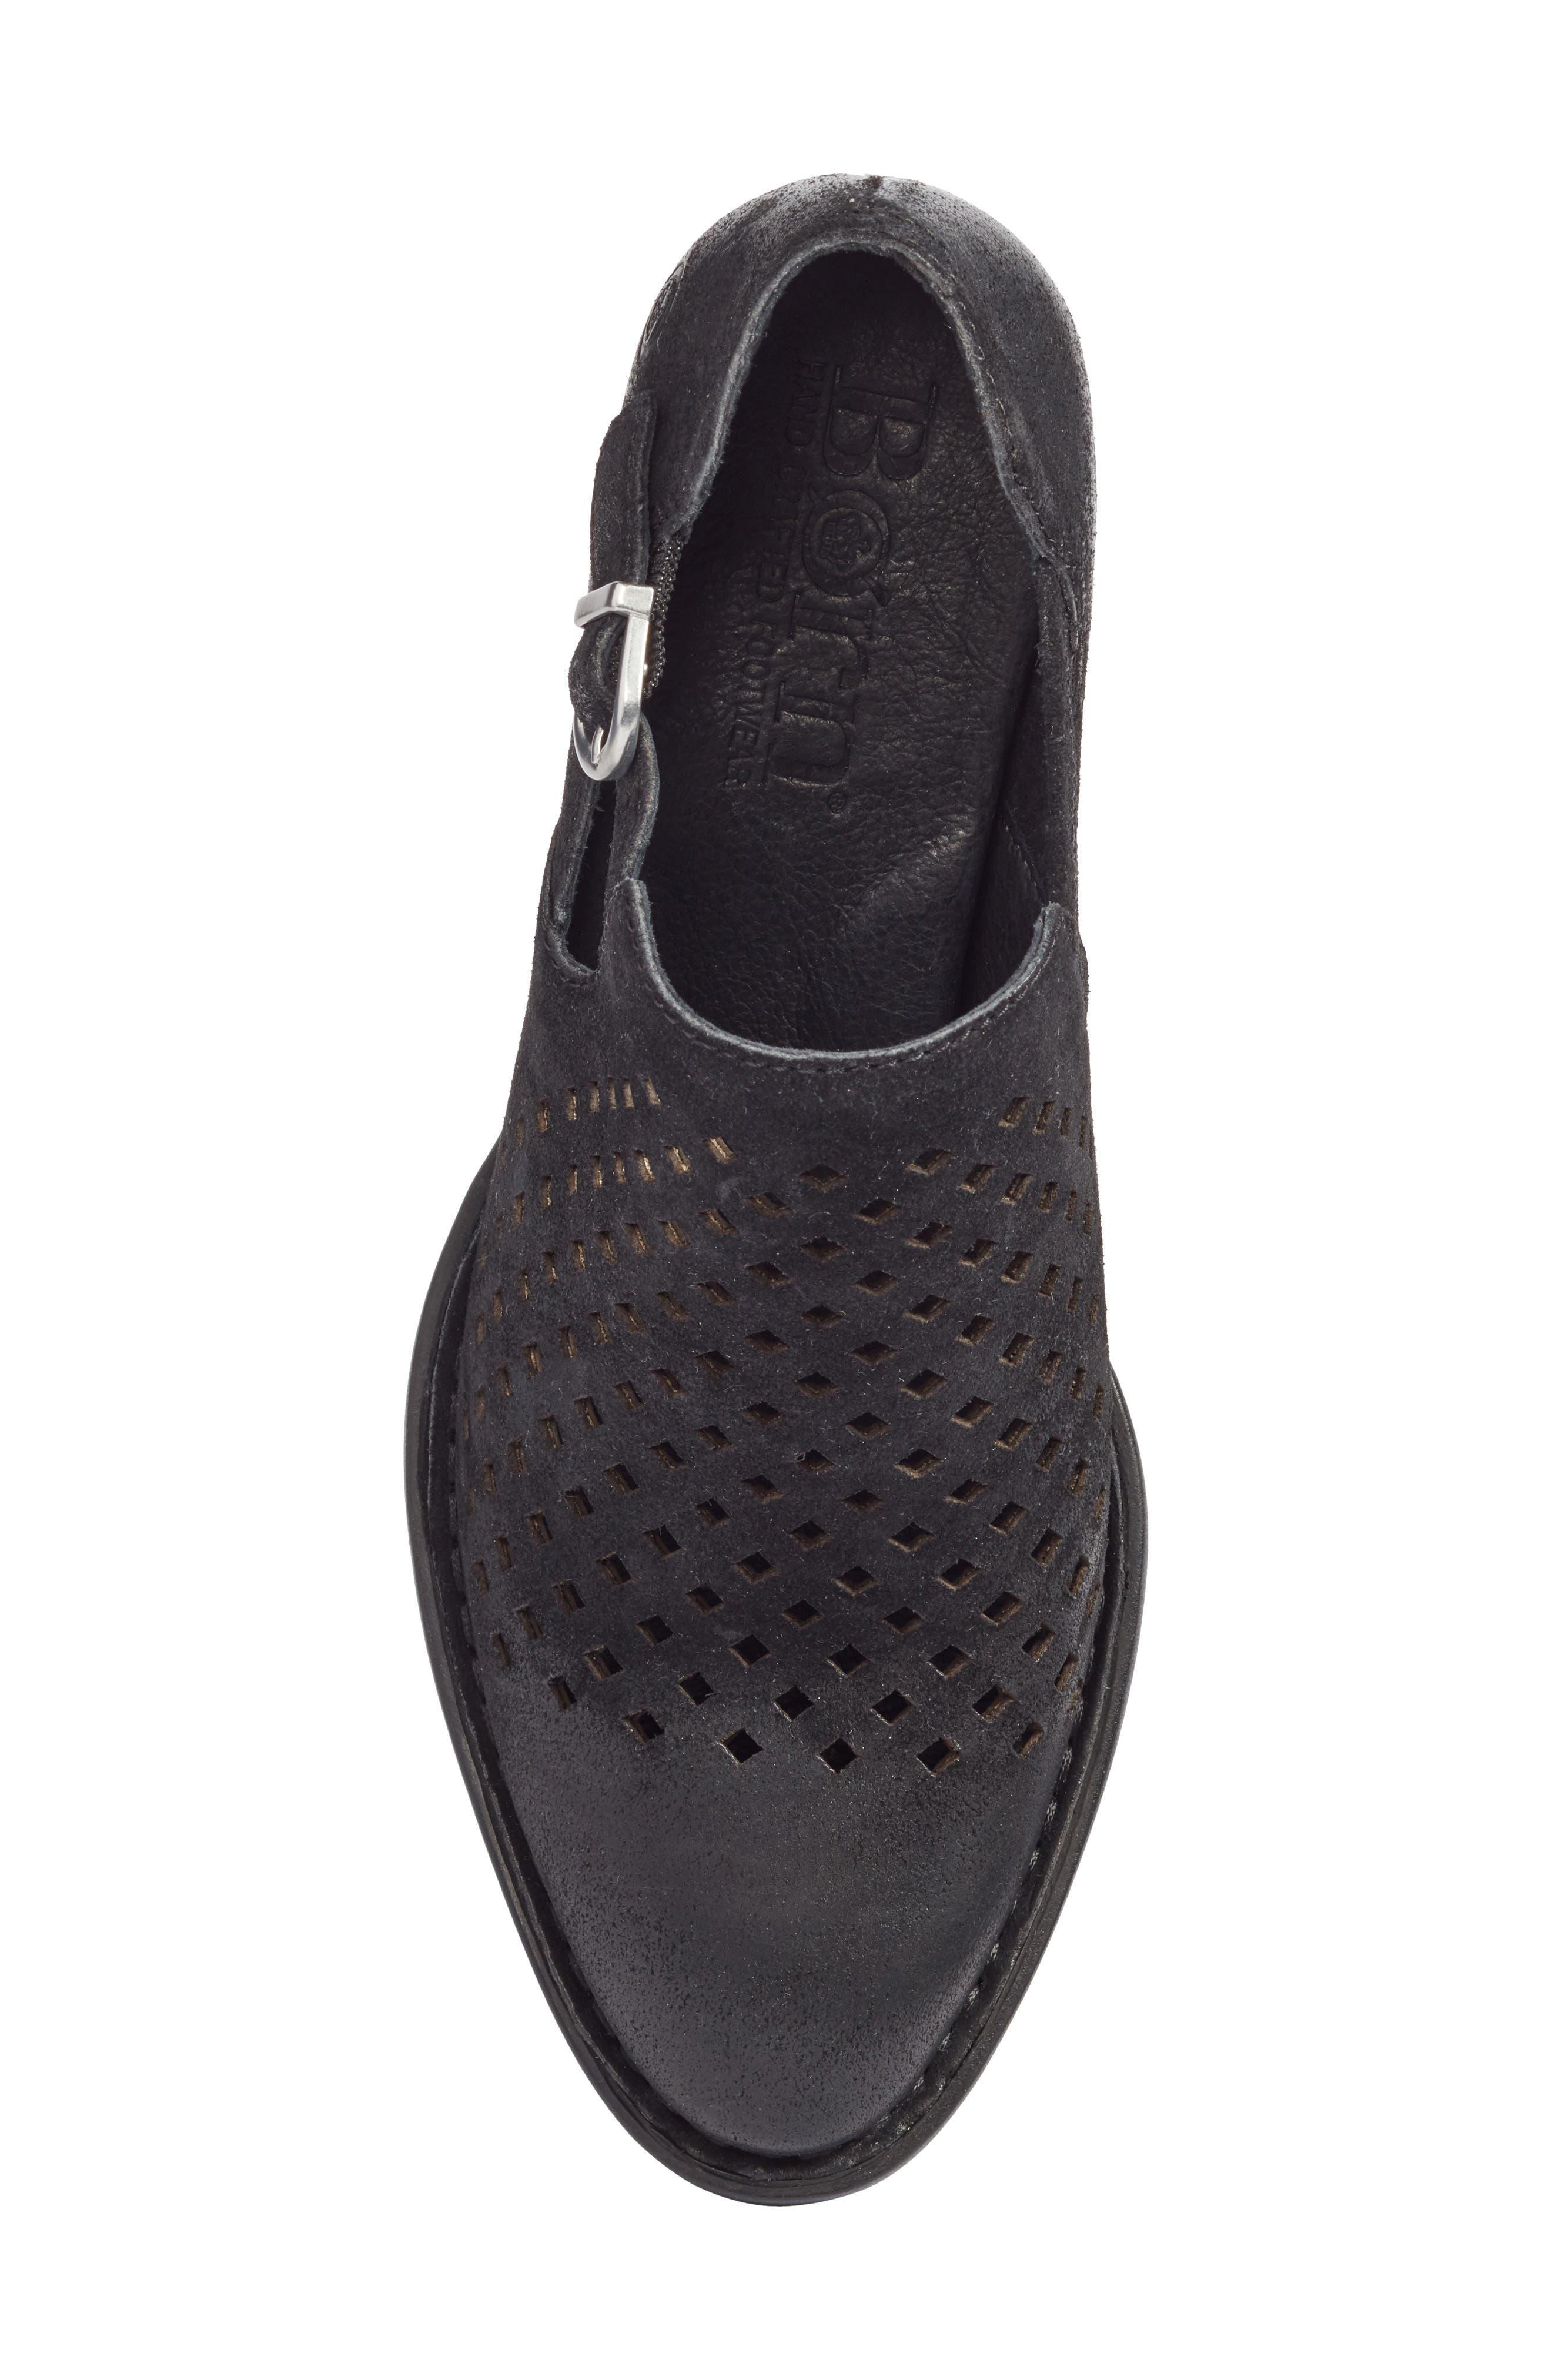 Nanna Bootie,                             Alternate thumbnail 5, color,                             Black Leather